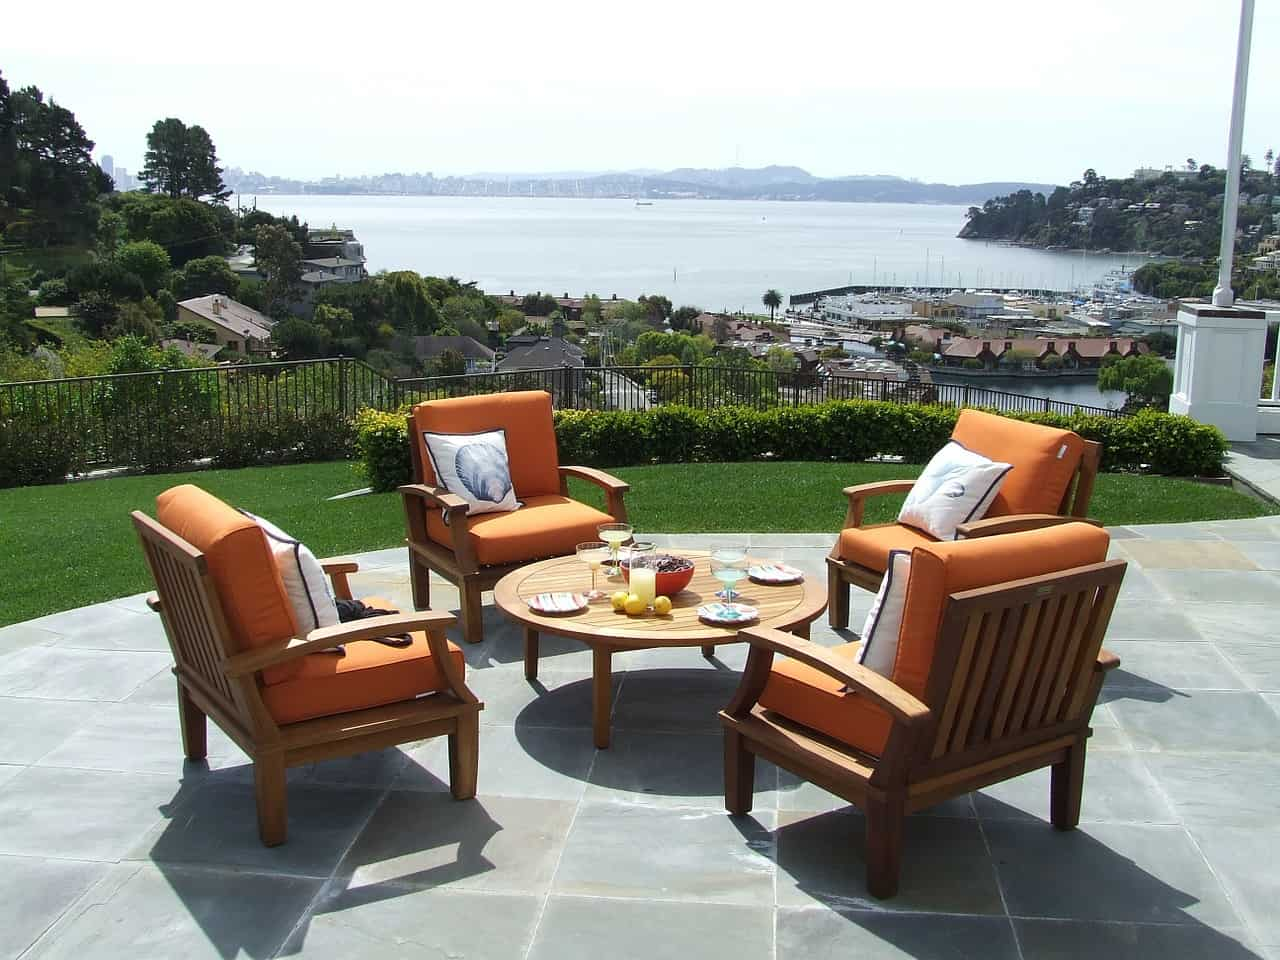 set of patio furniture